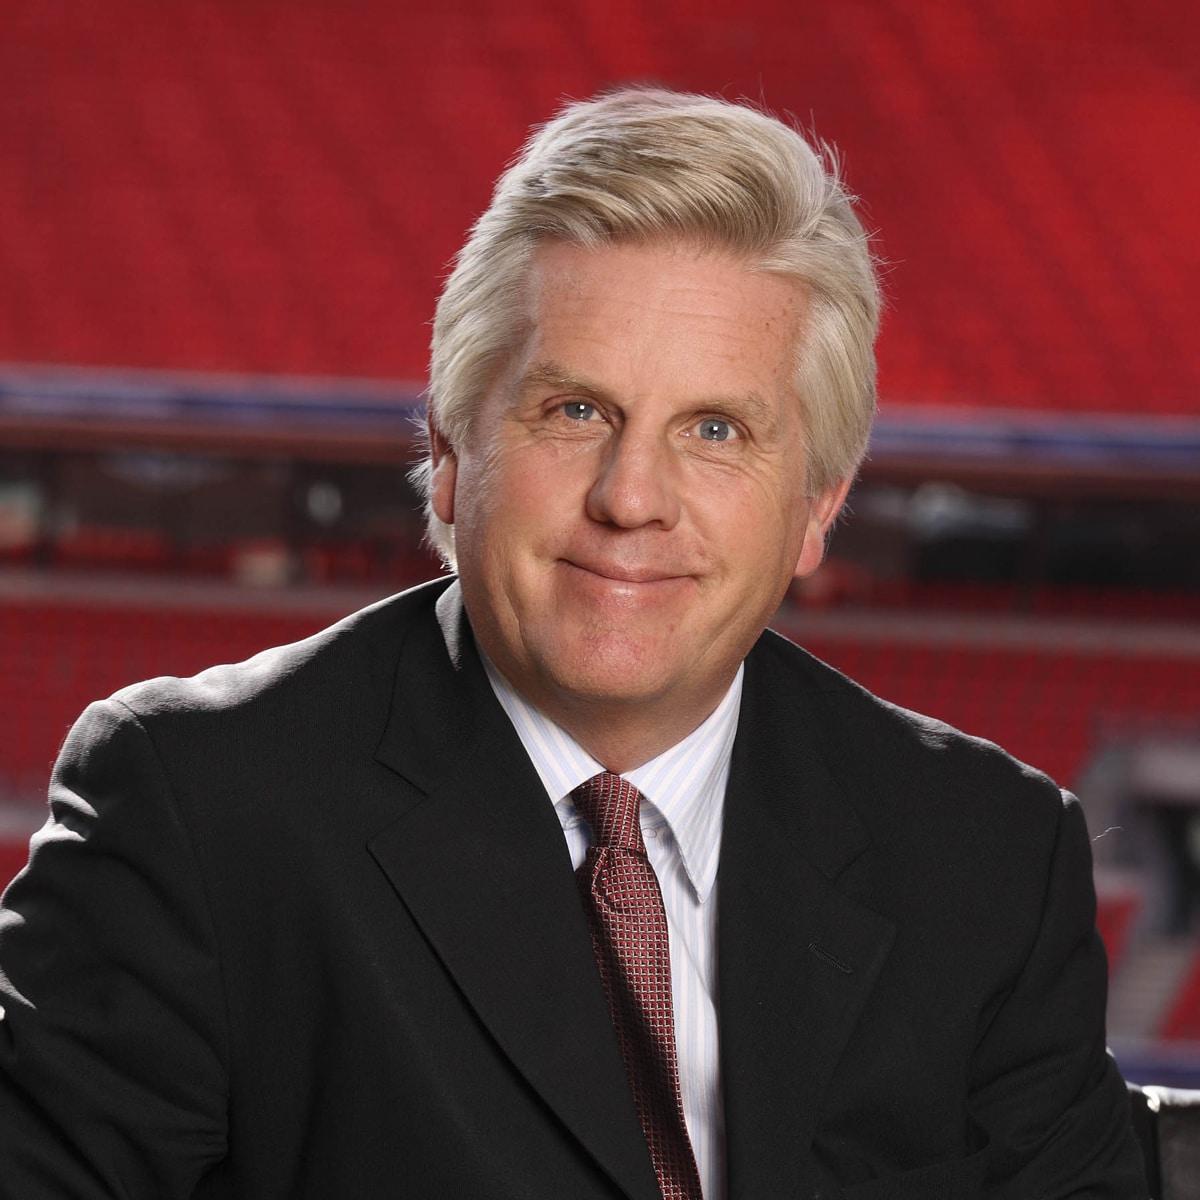 Steve-Rider-award-winning-sports-tv-broadcaster-journalist-writer-speaker-host-at-Great-British-Speakers